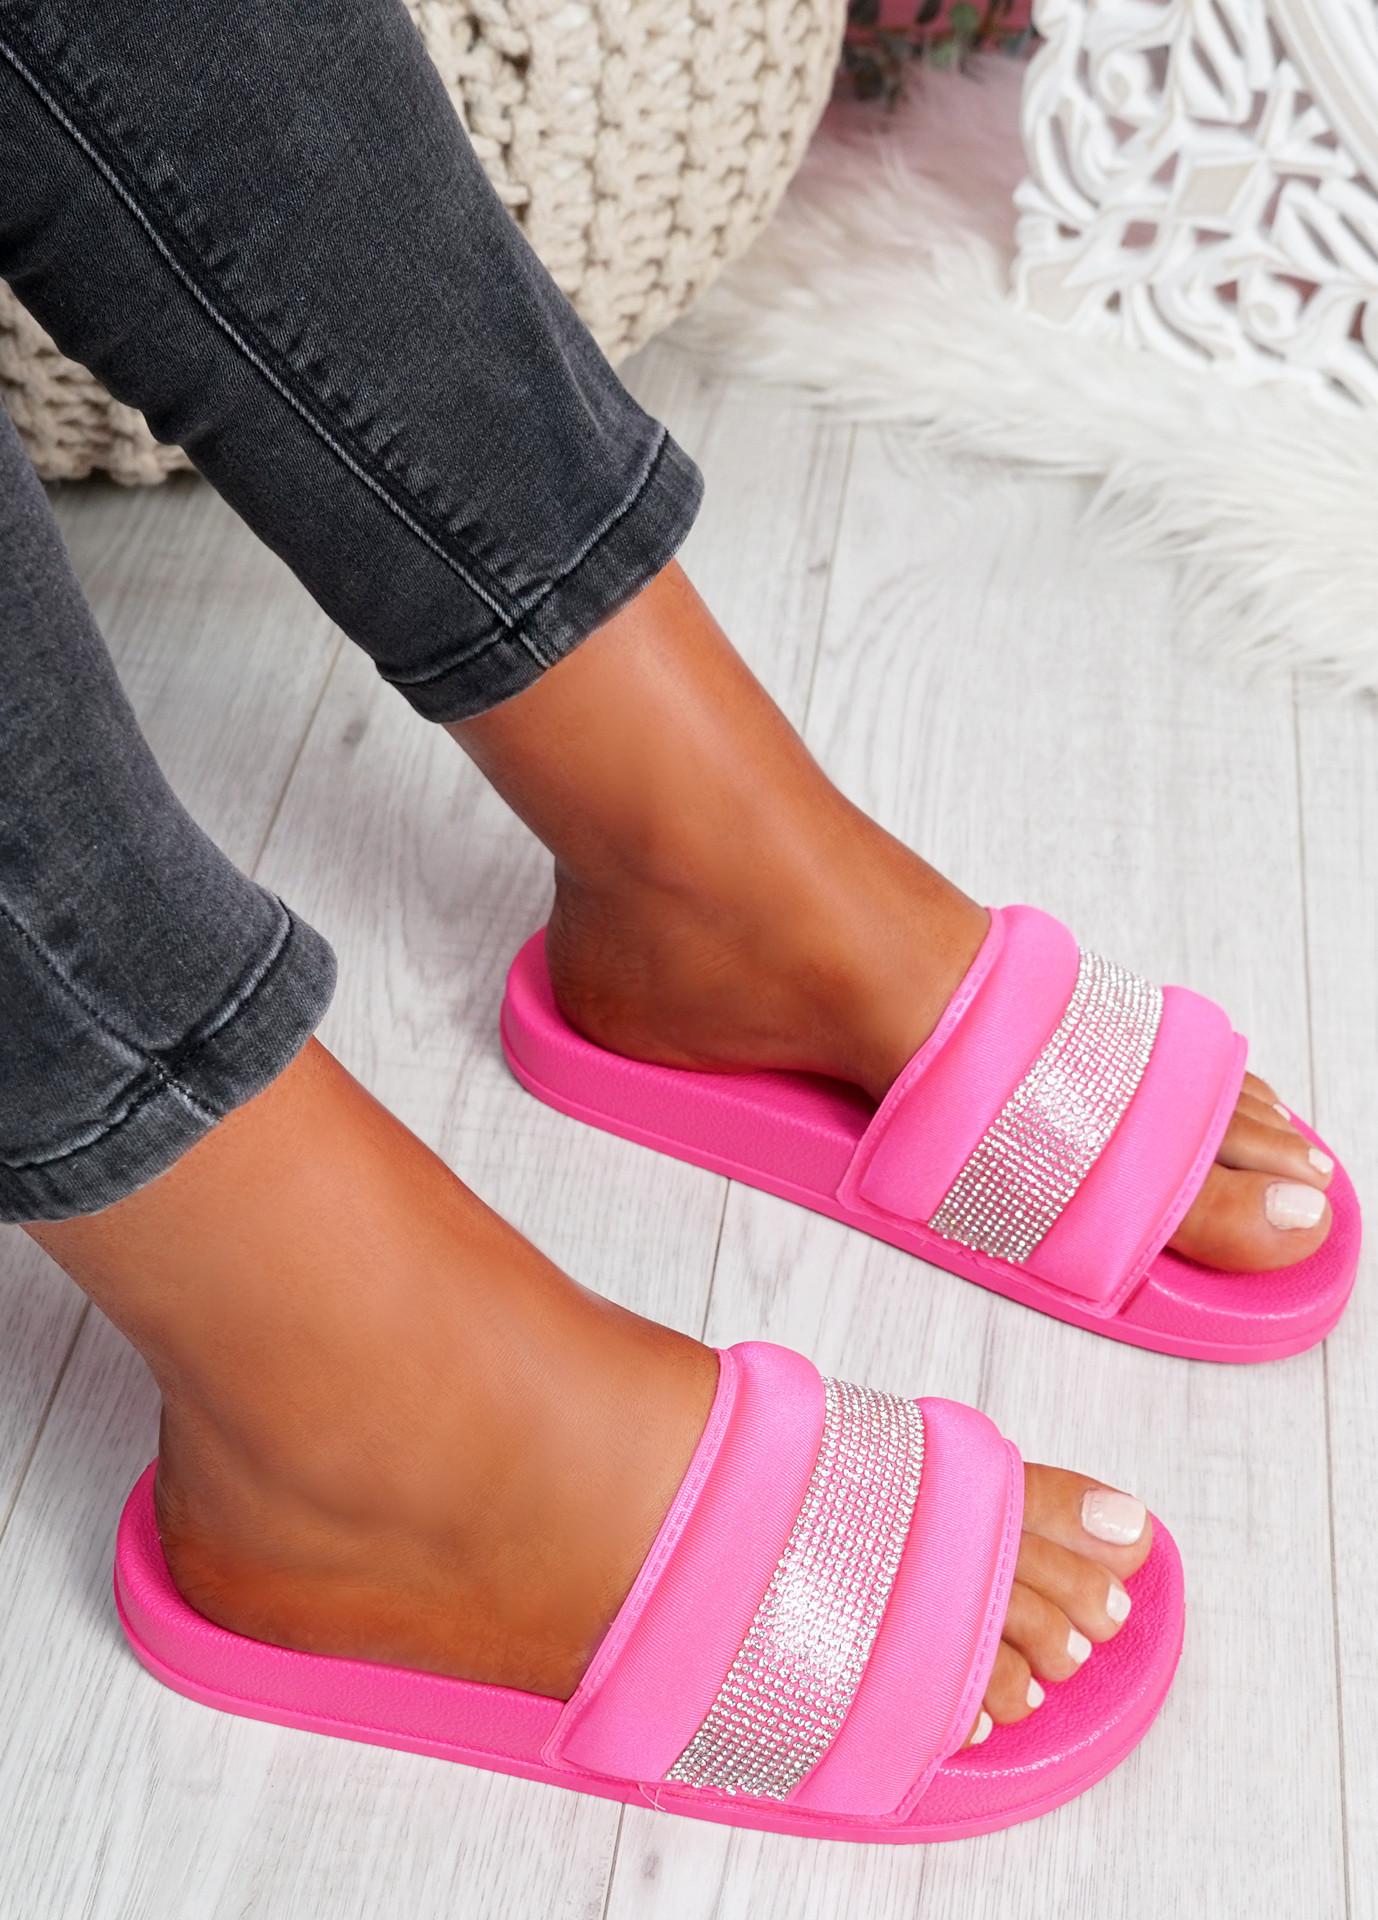 Nitto Fuchsia Diamante Studded Flat Sandals